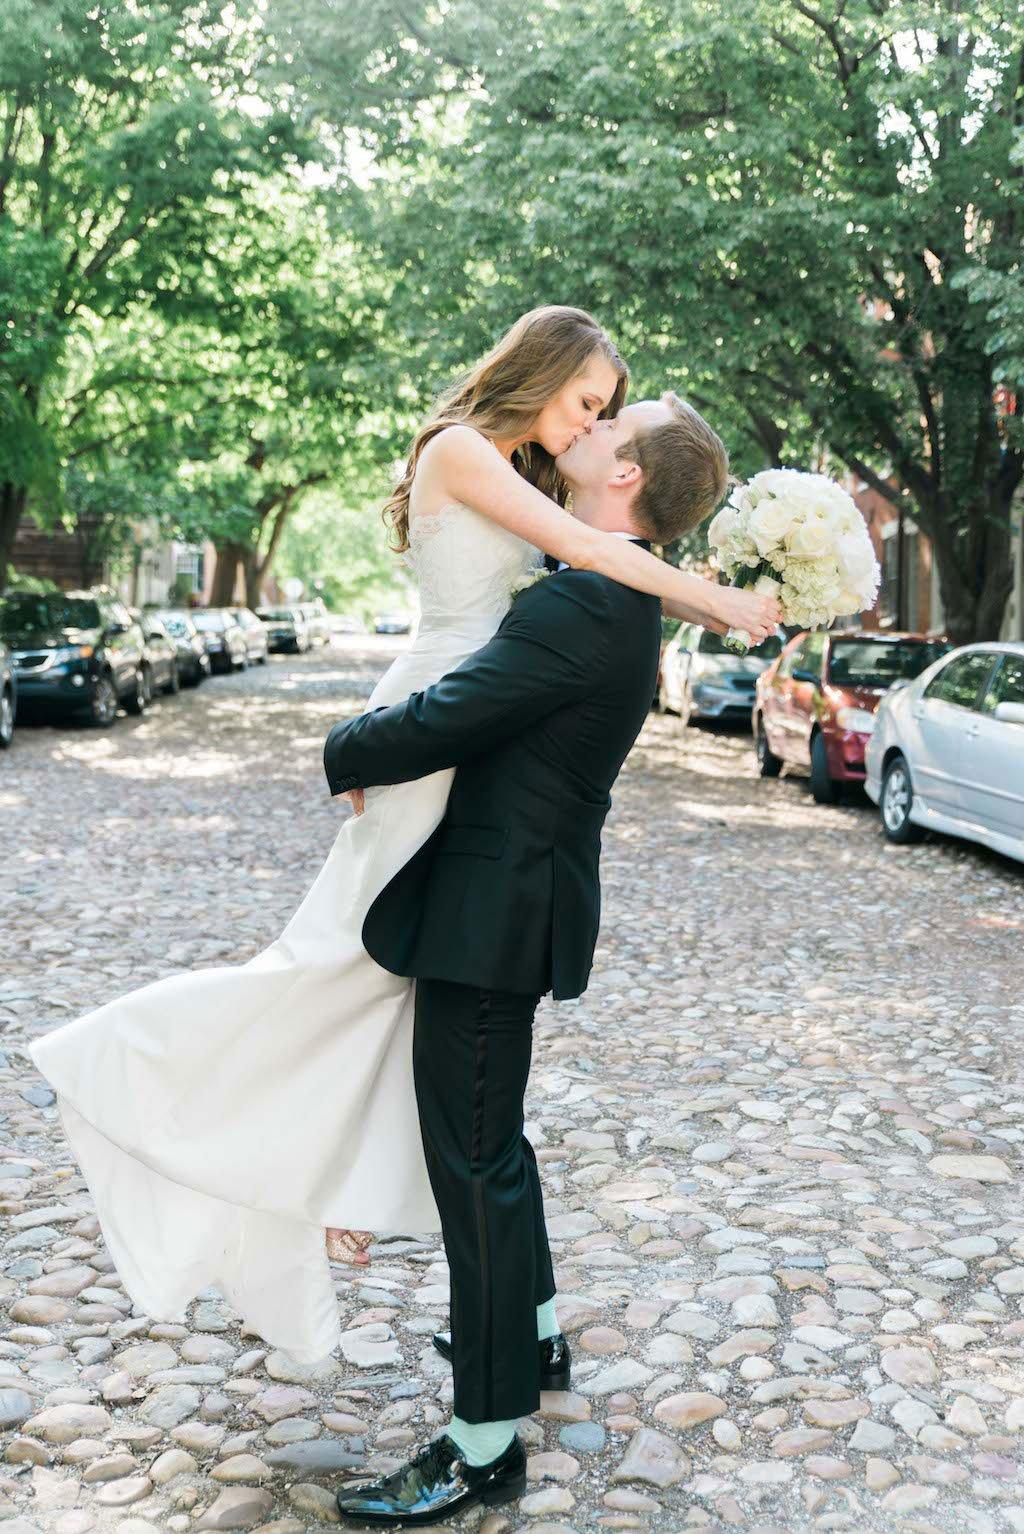 4-27-16-mint-green-gold-old-town-alexandria-virginia-wedding-9